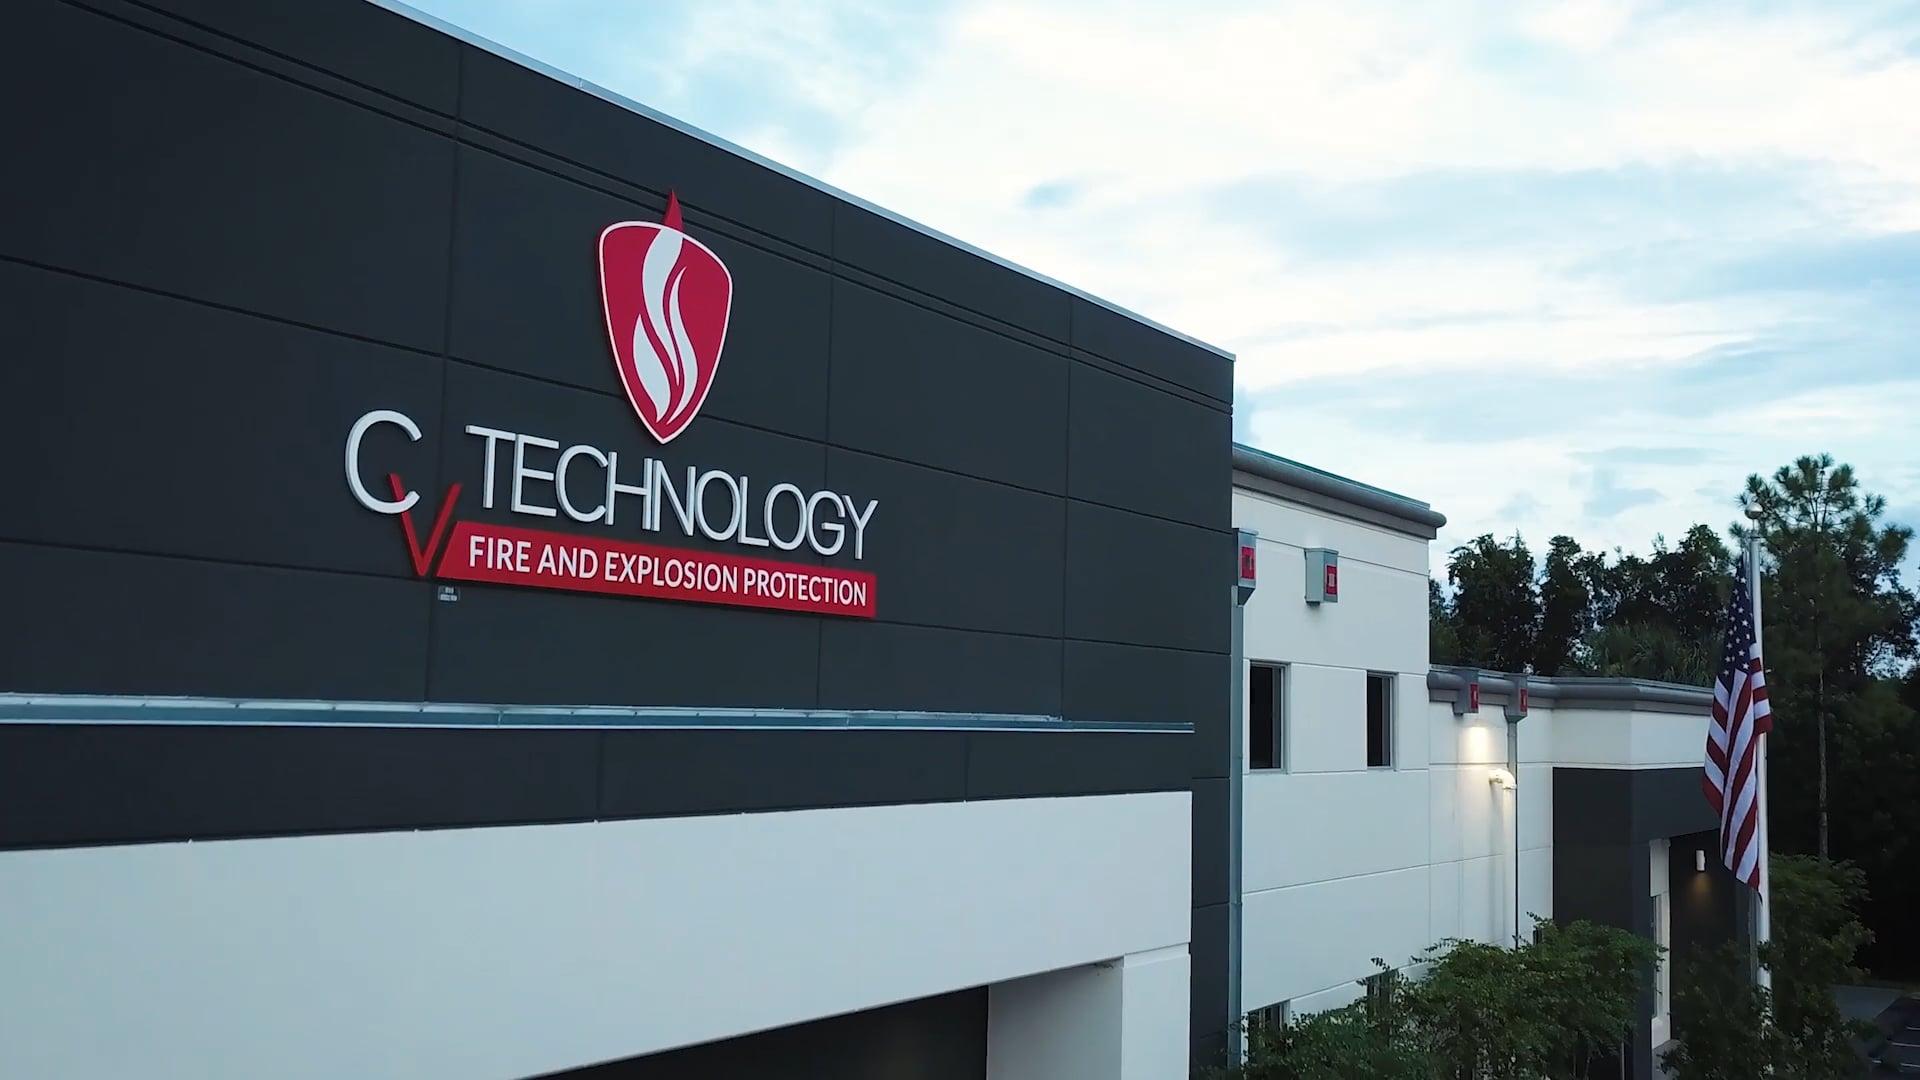 CV Technology: Corporate Brand Video